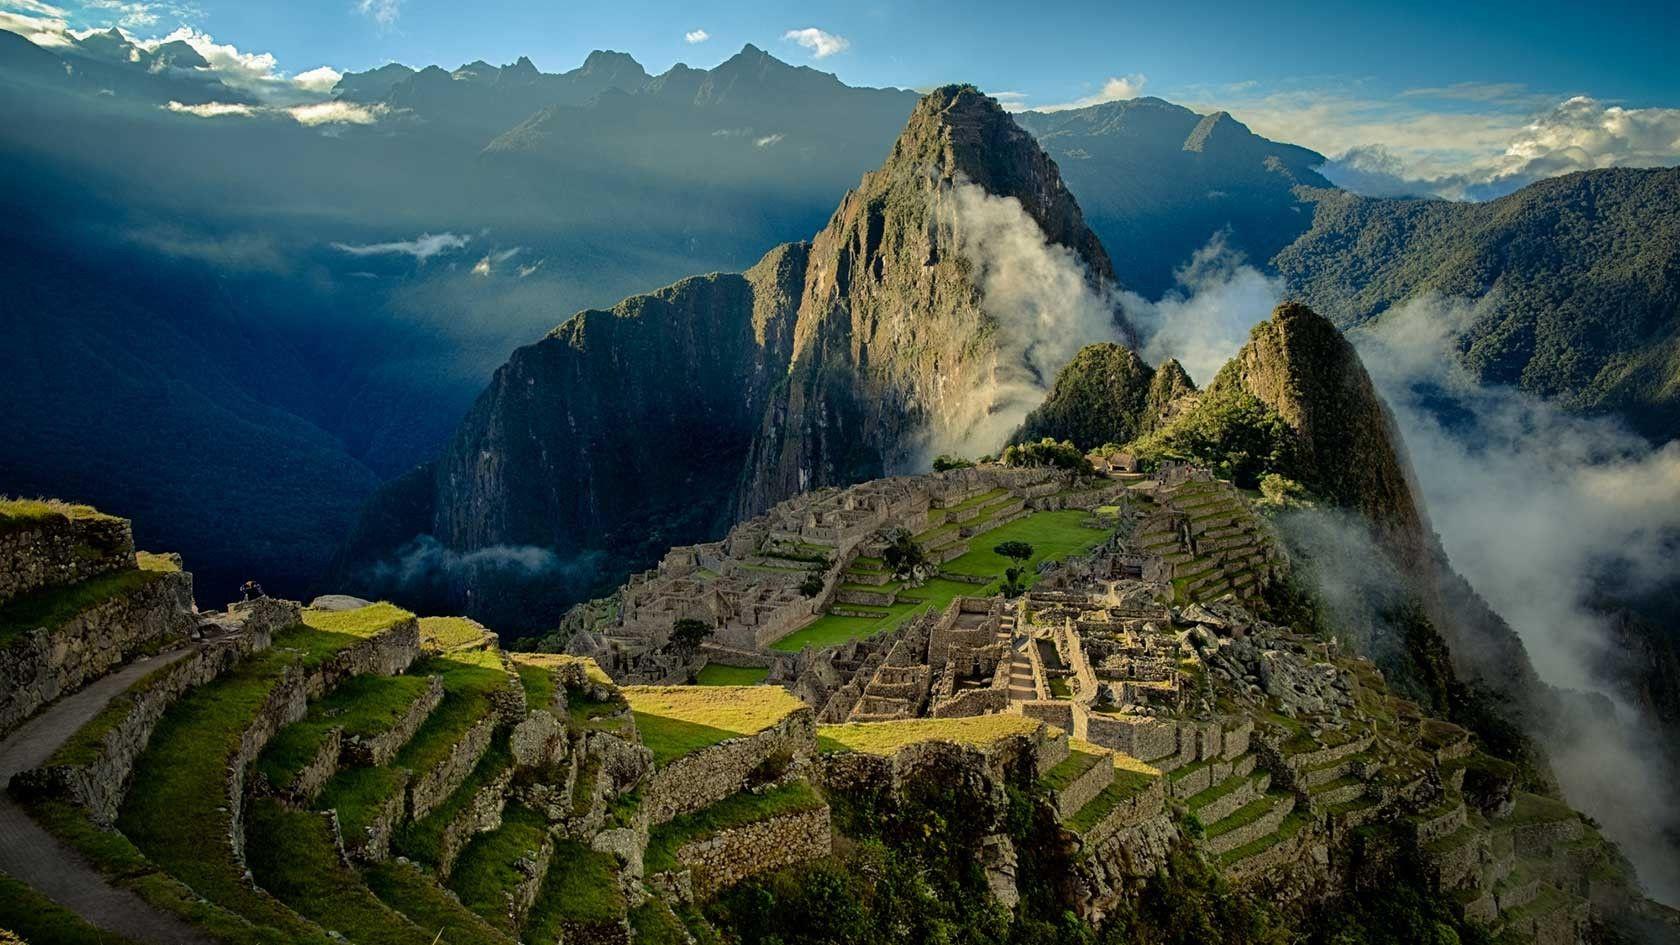 Machu Picchu Peru Wallpaper HD Background Download Desktop 1024x768 Wallpapers 10